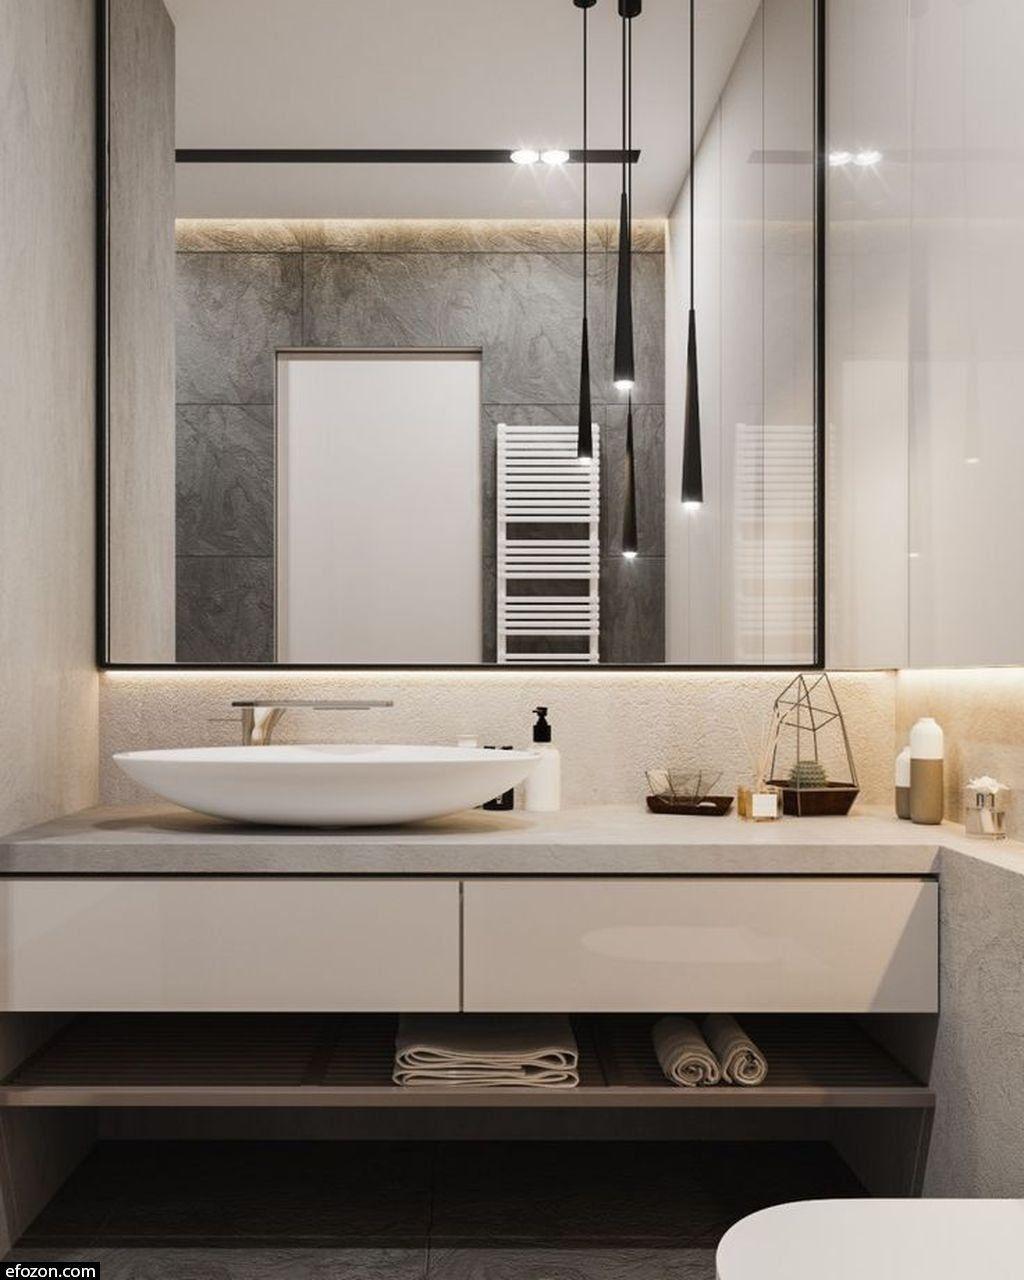 40 Charming Bathroom Mirror Design Ideas For Every Style Image 19 Of 47 In 2021 Big Bathrooms Large Bathroom Mirrors Bathroom Decor